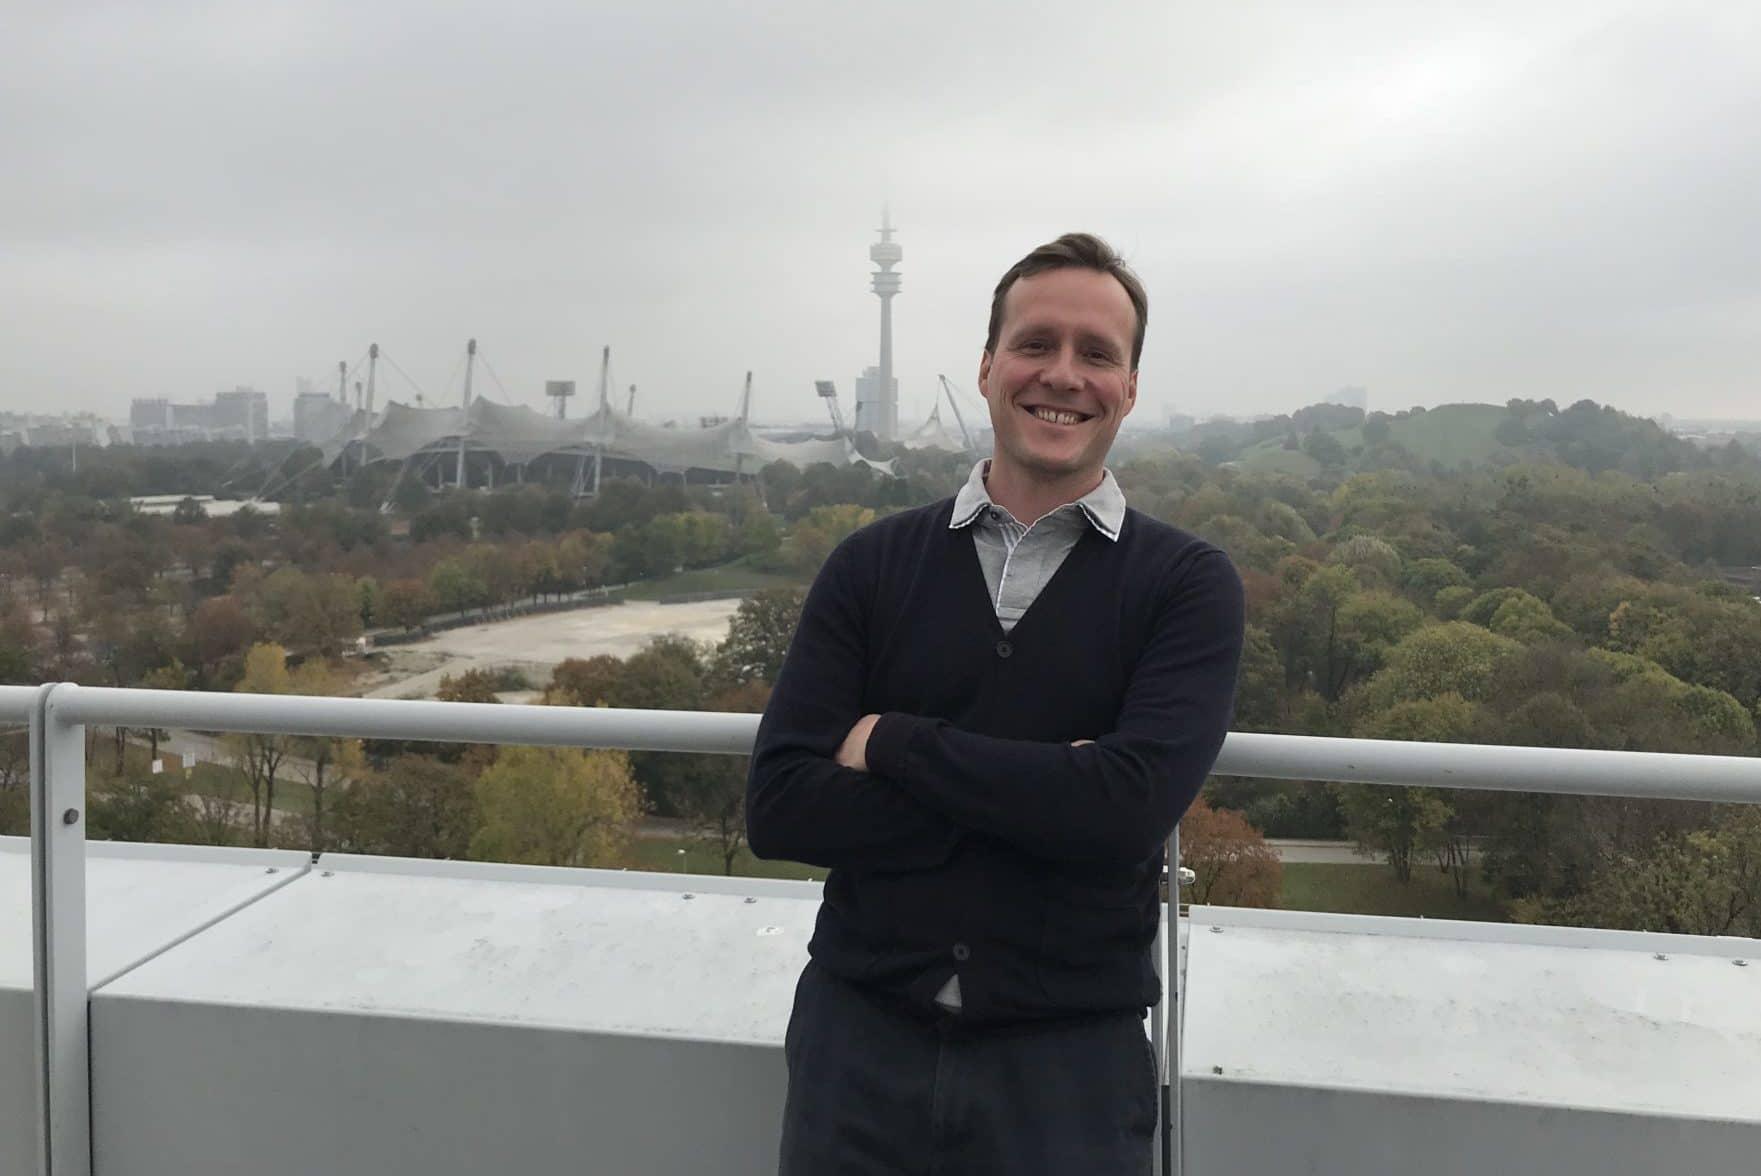 #Inside-AT: Unser neuer Senior Data Science Project Manager & Senior Data Strategist Dr. Nicholas Drude.